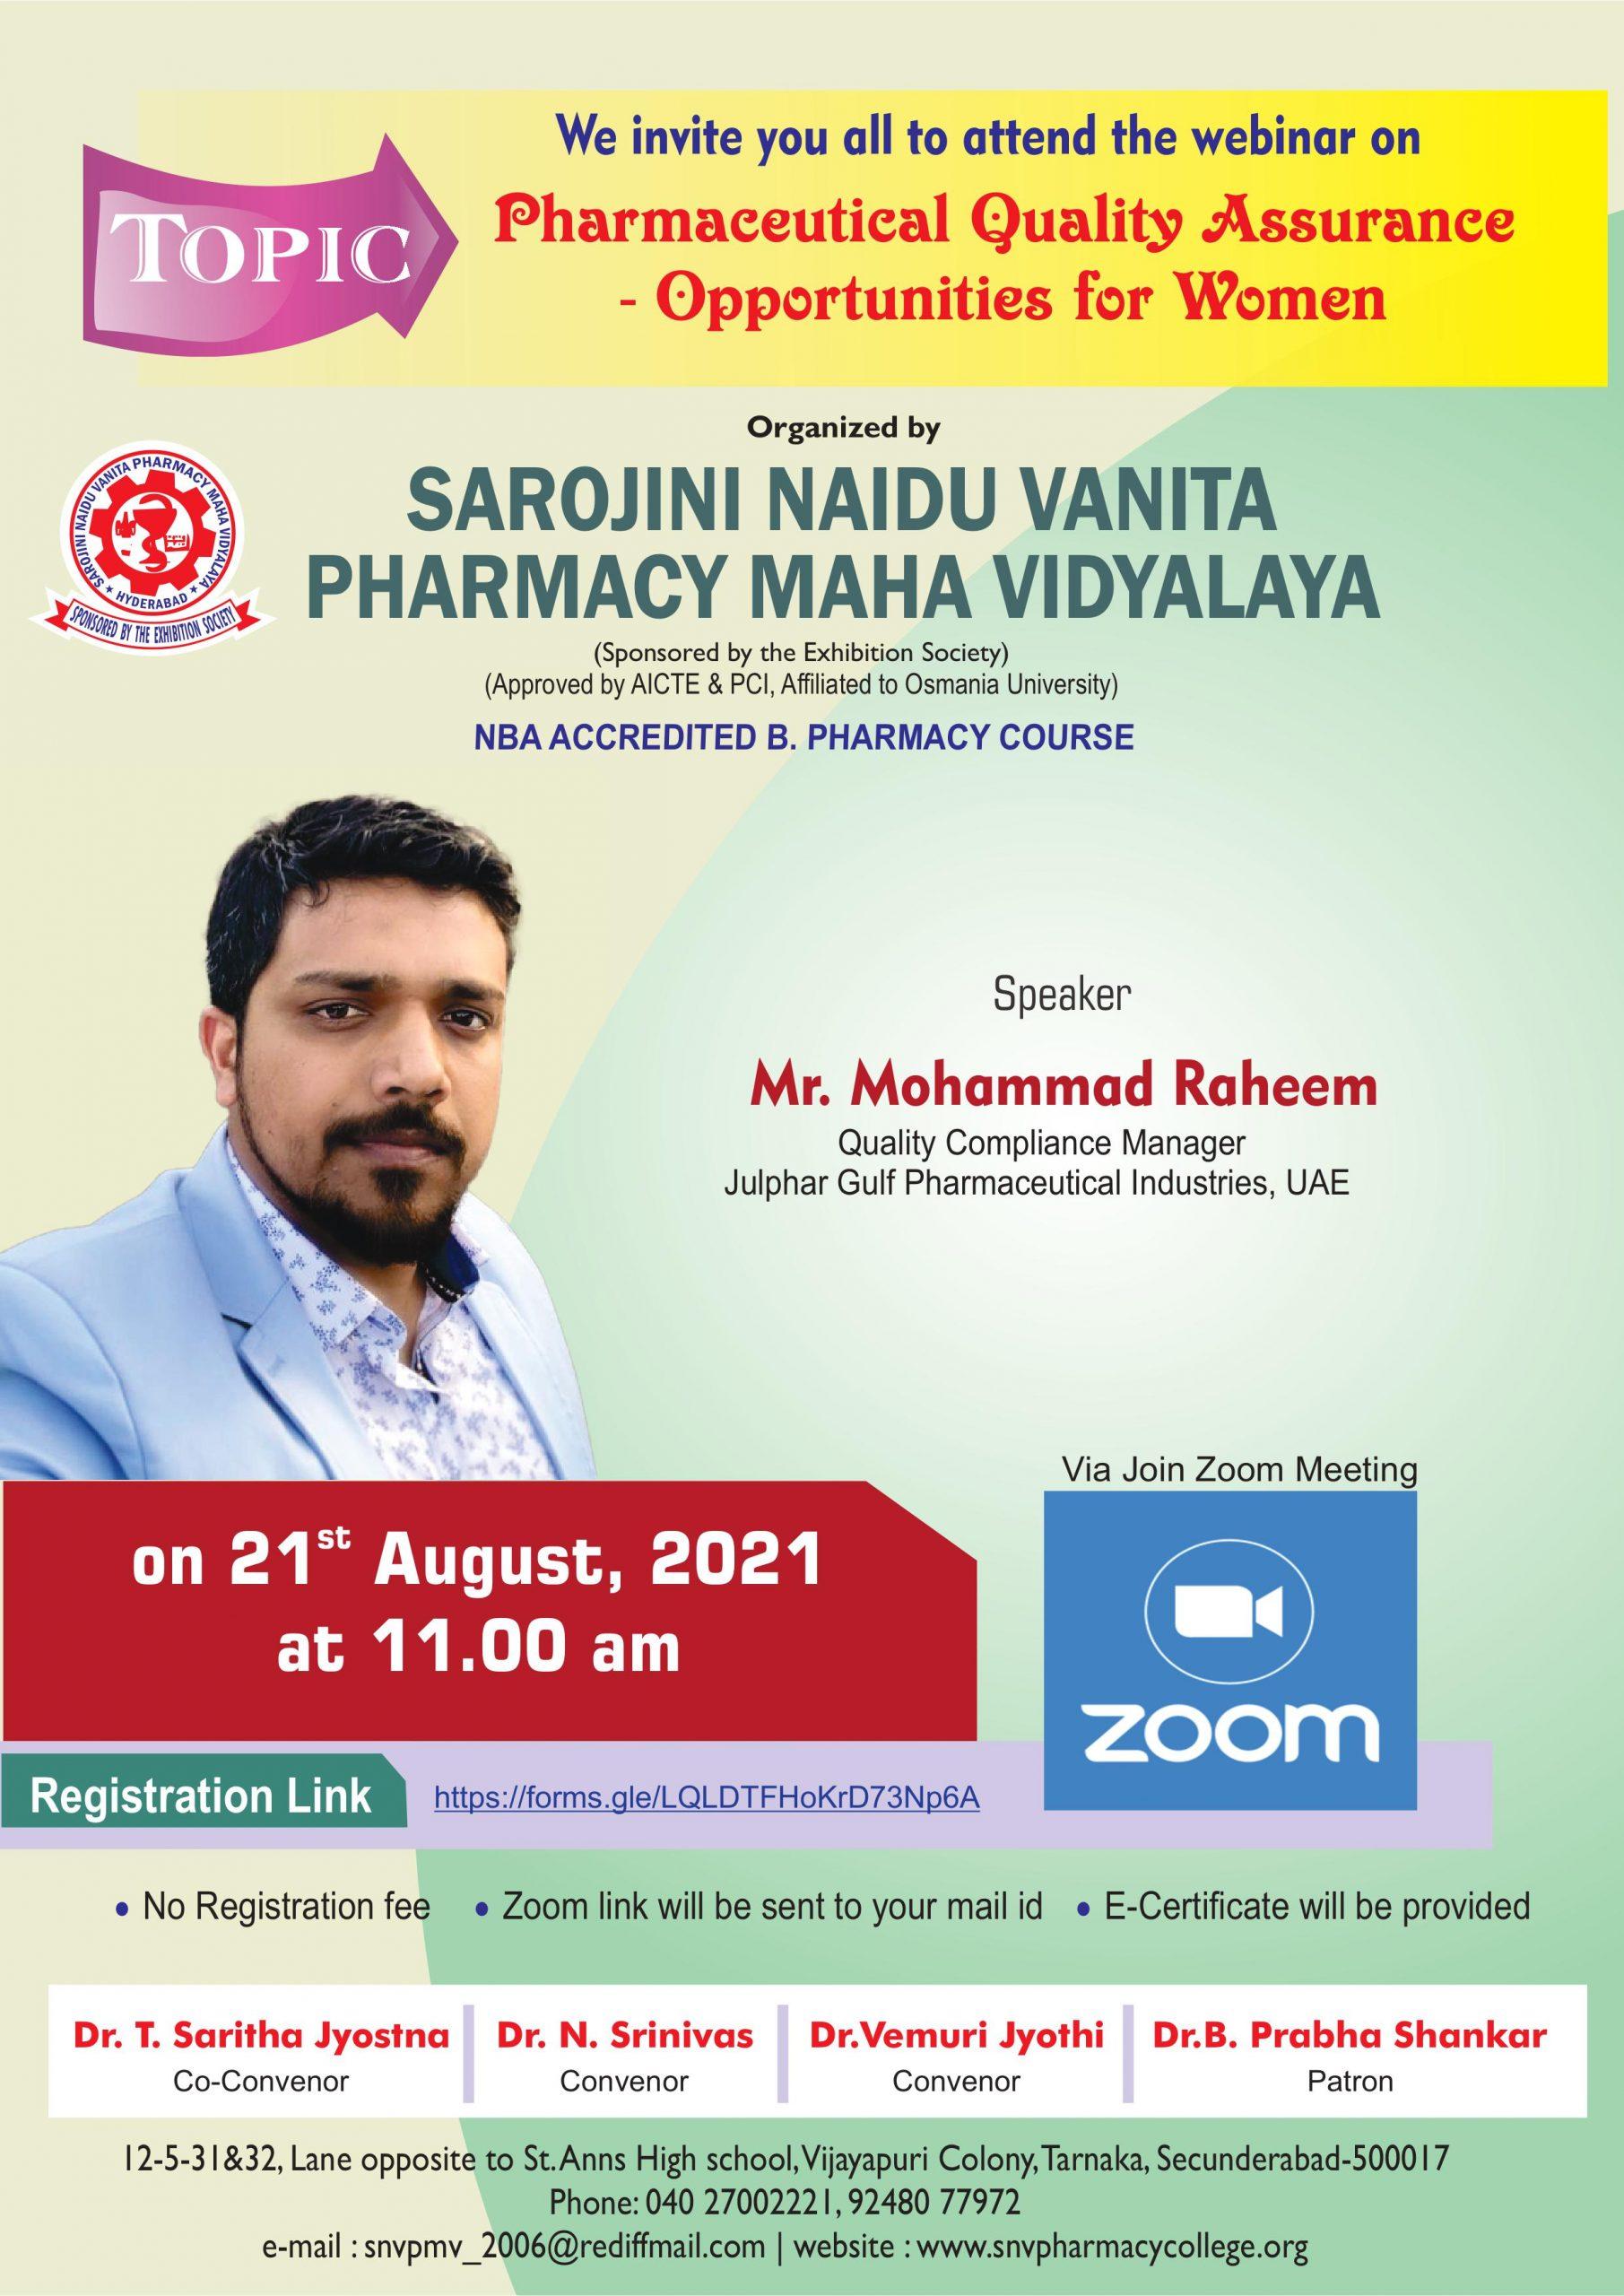 Webinar on 21st August